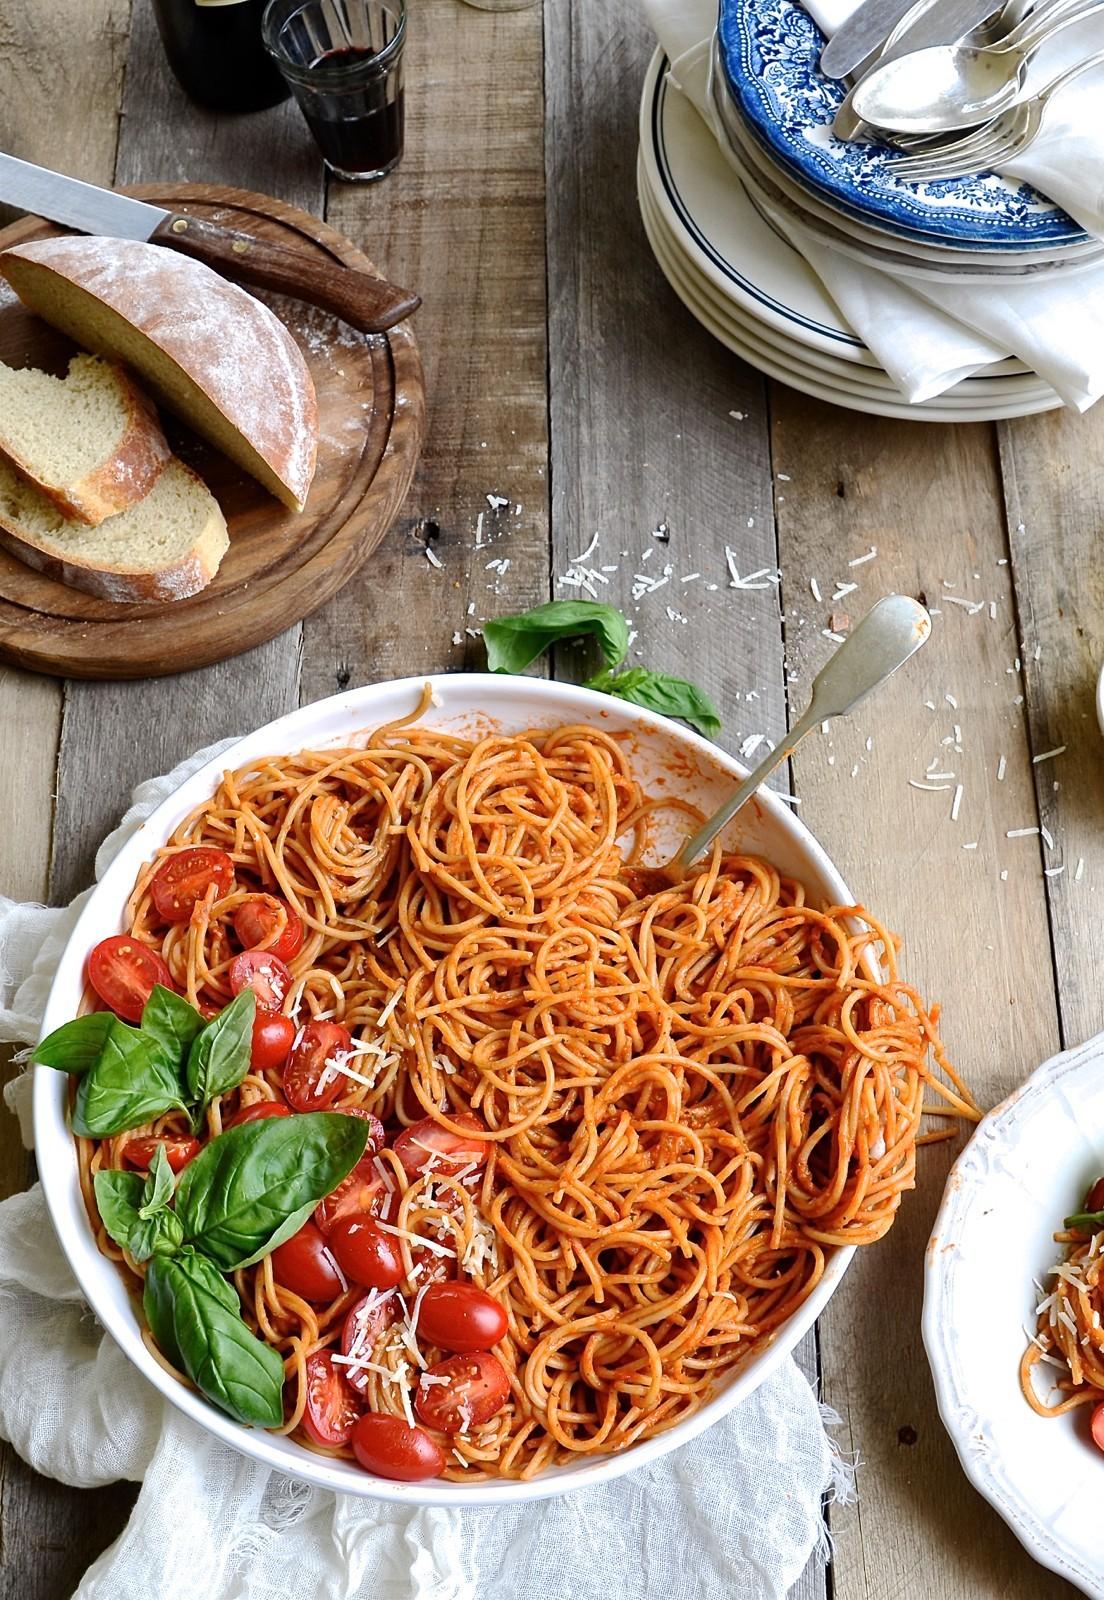 Spaghetti with roasted tomato sauce